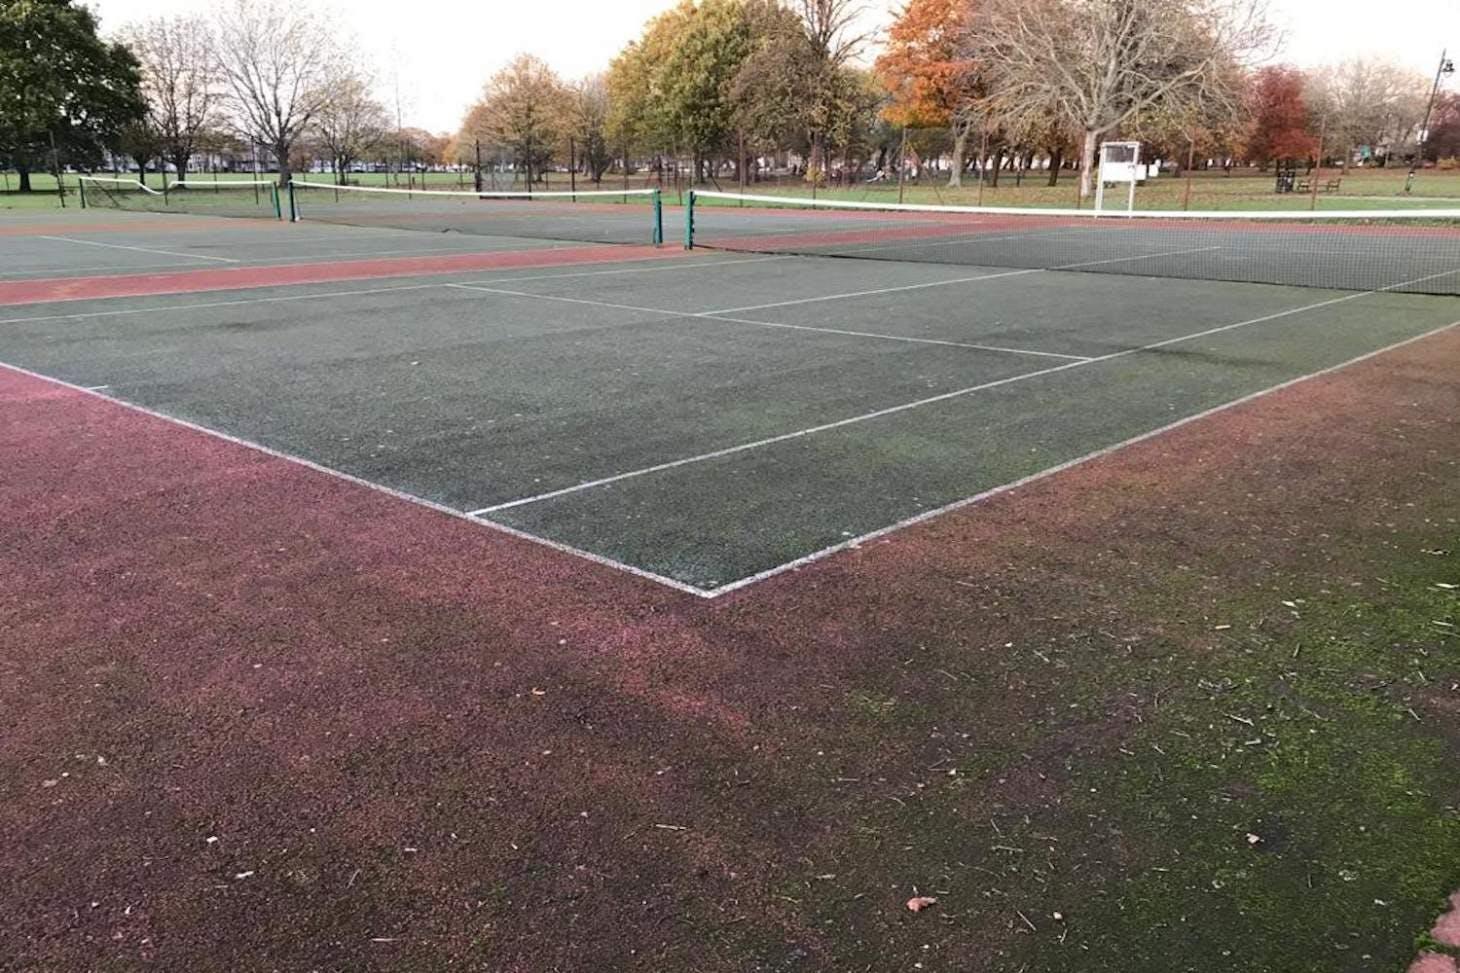 The Racecourse Outdoor | Hard (macadam) tennis court